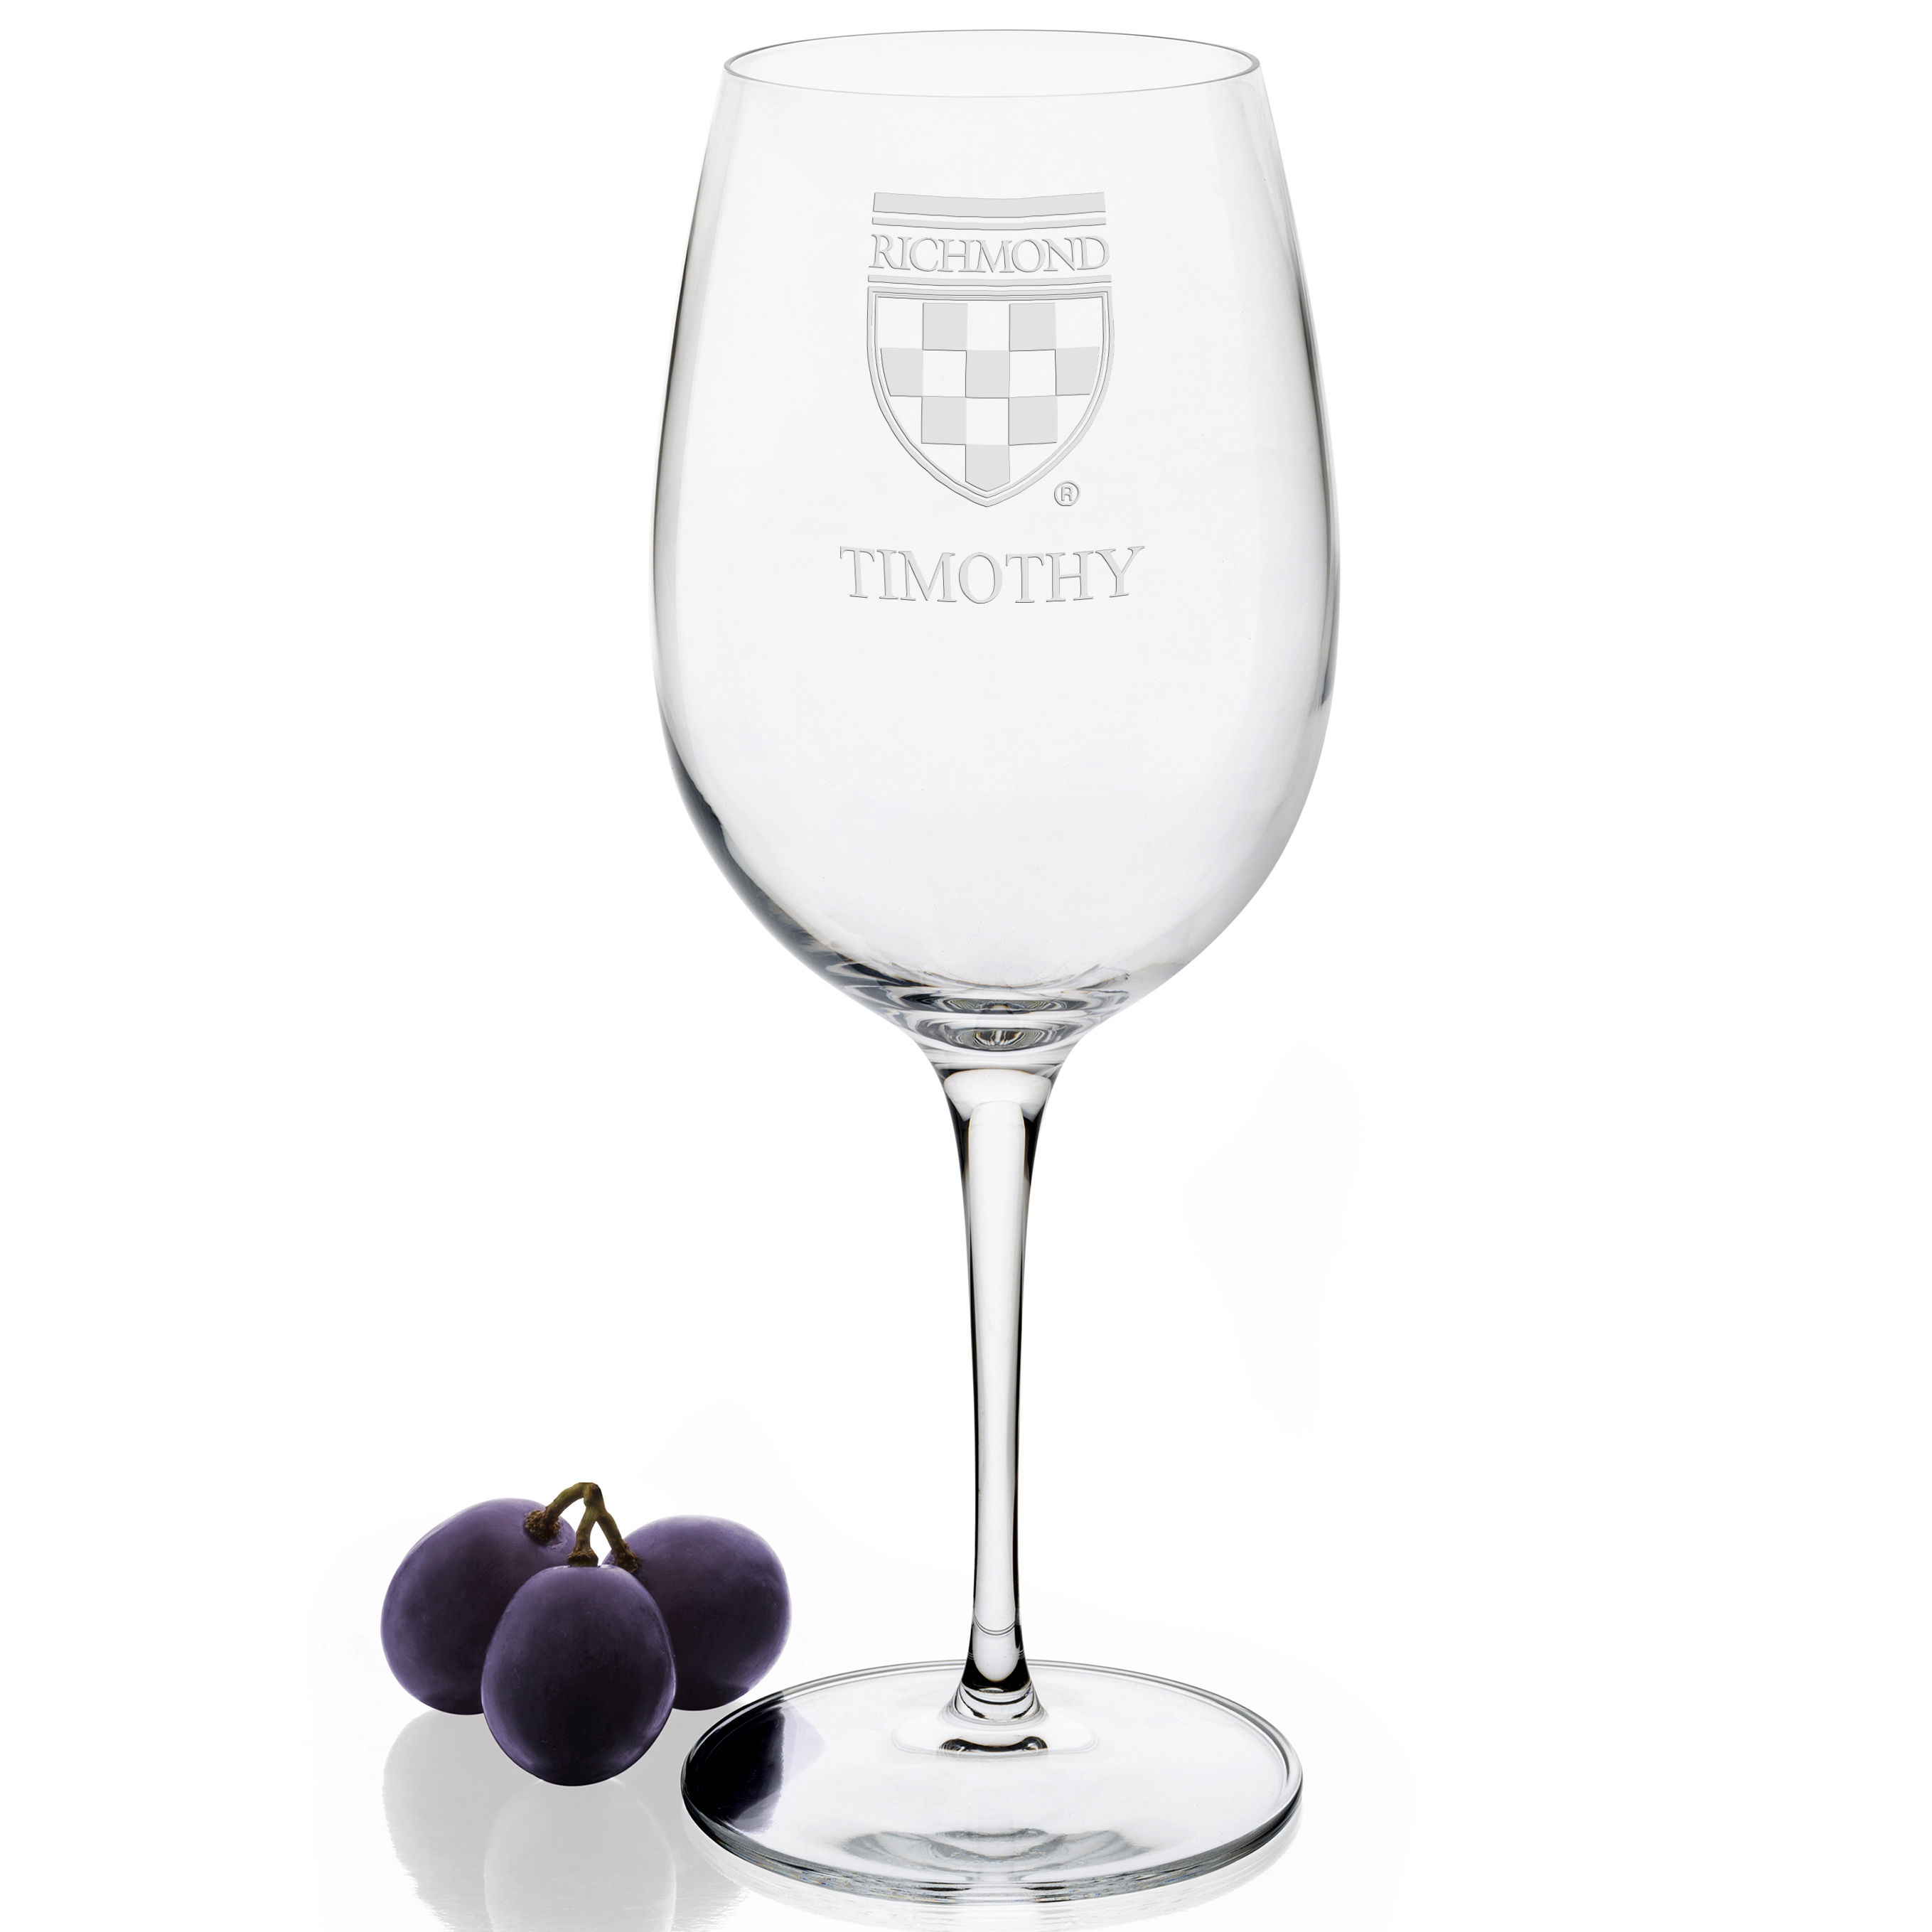 University of Richmond Red Wine Glasses - Set of 2 - Image 2